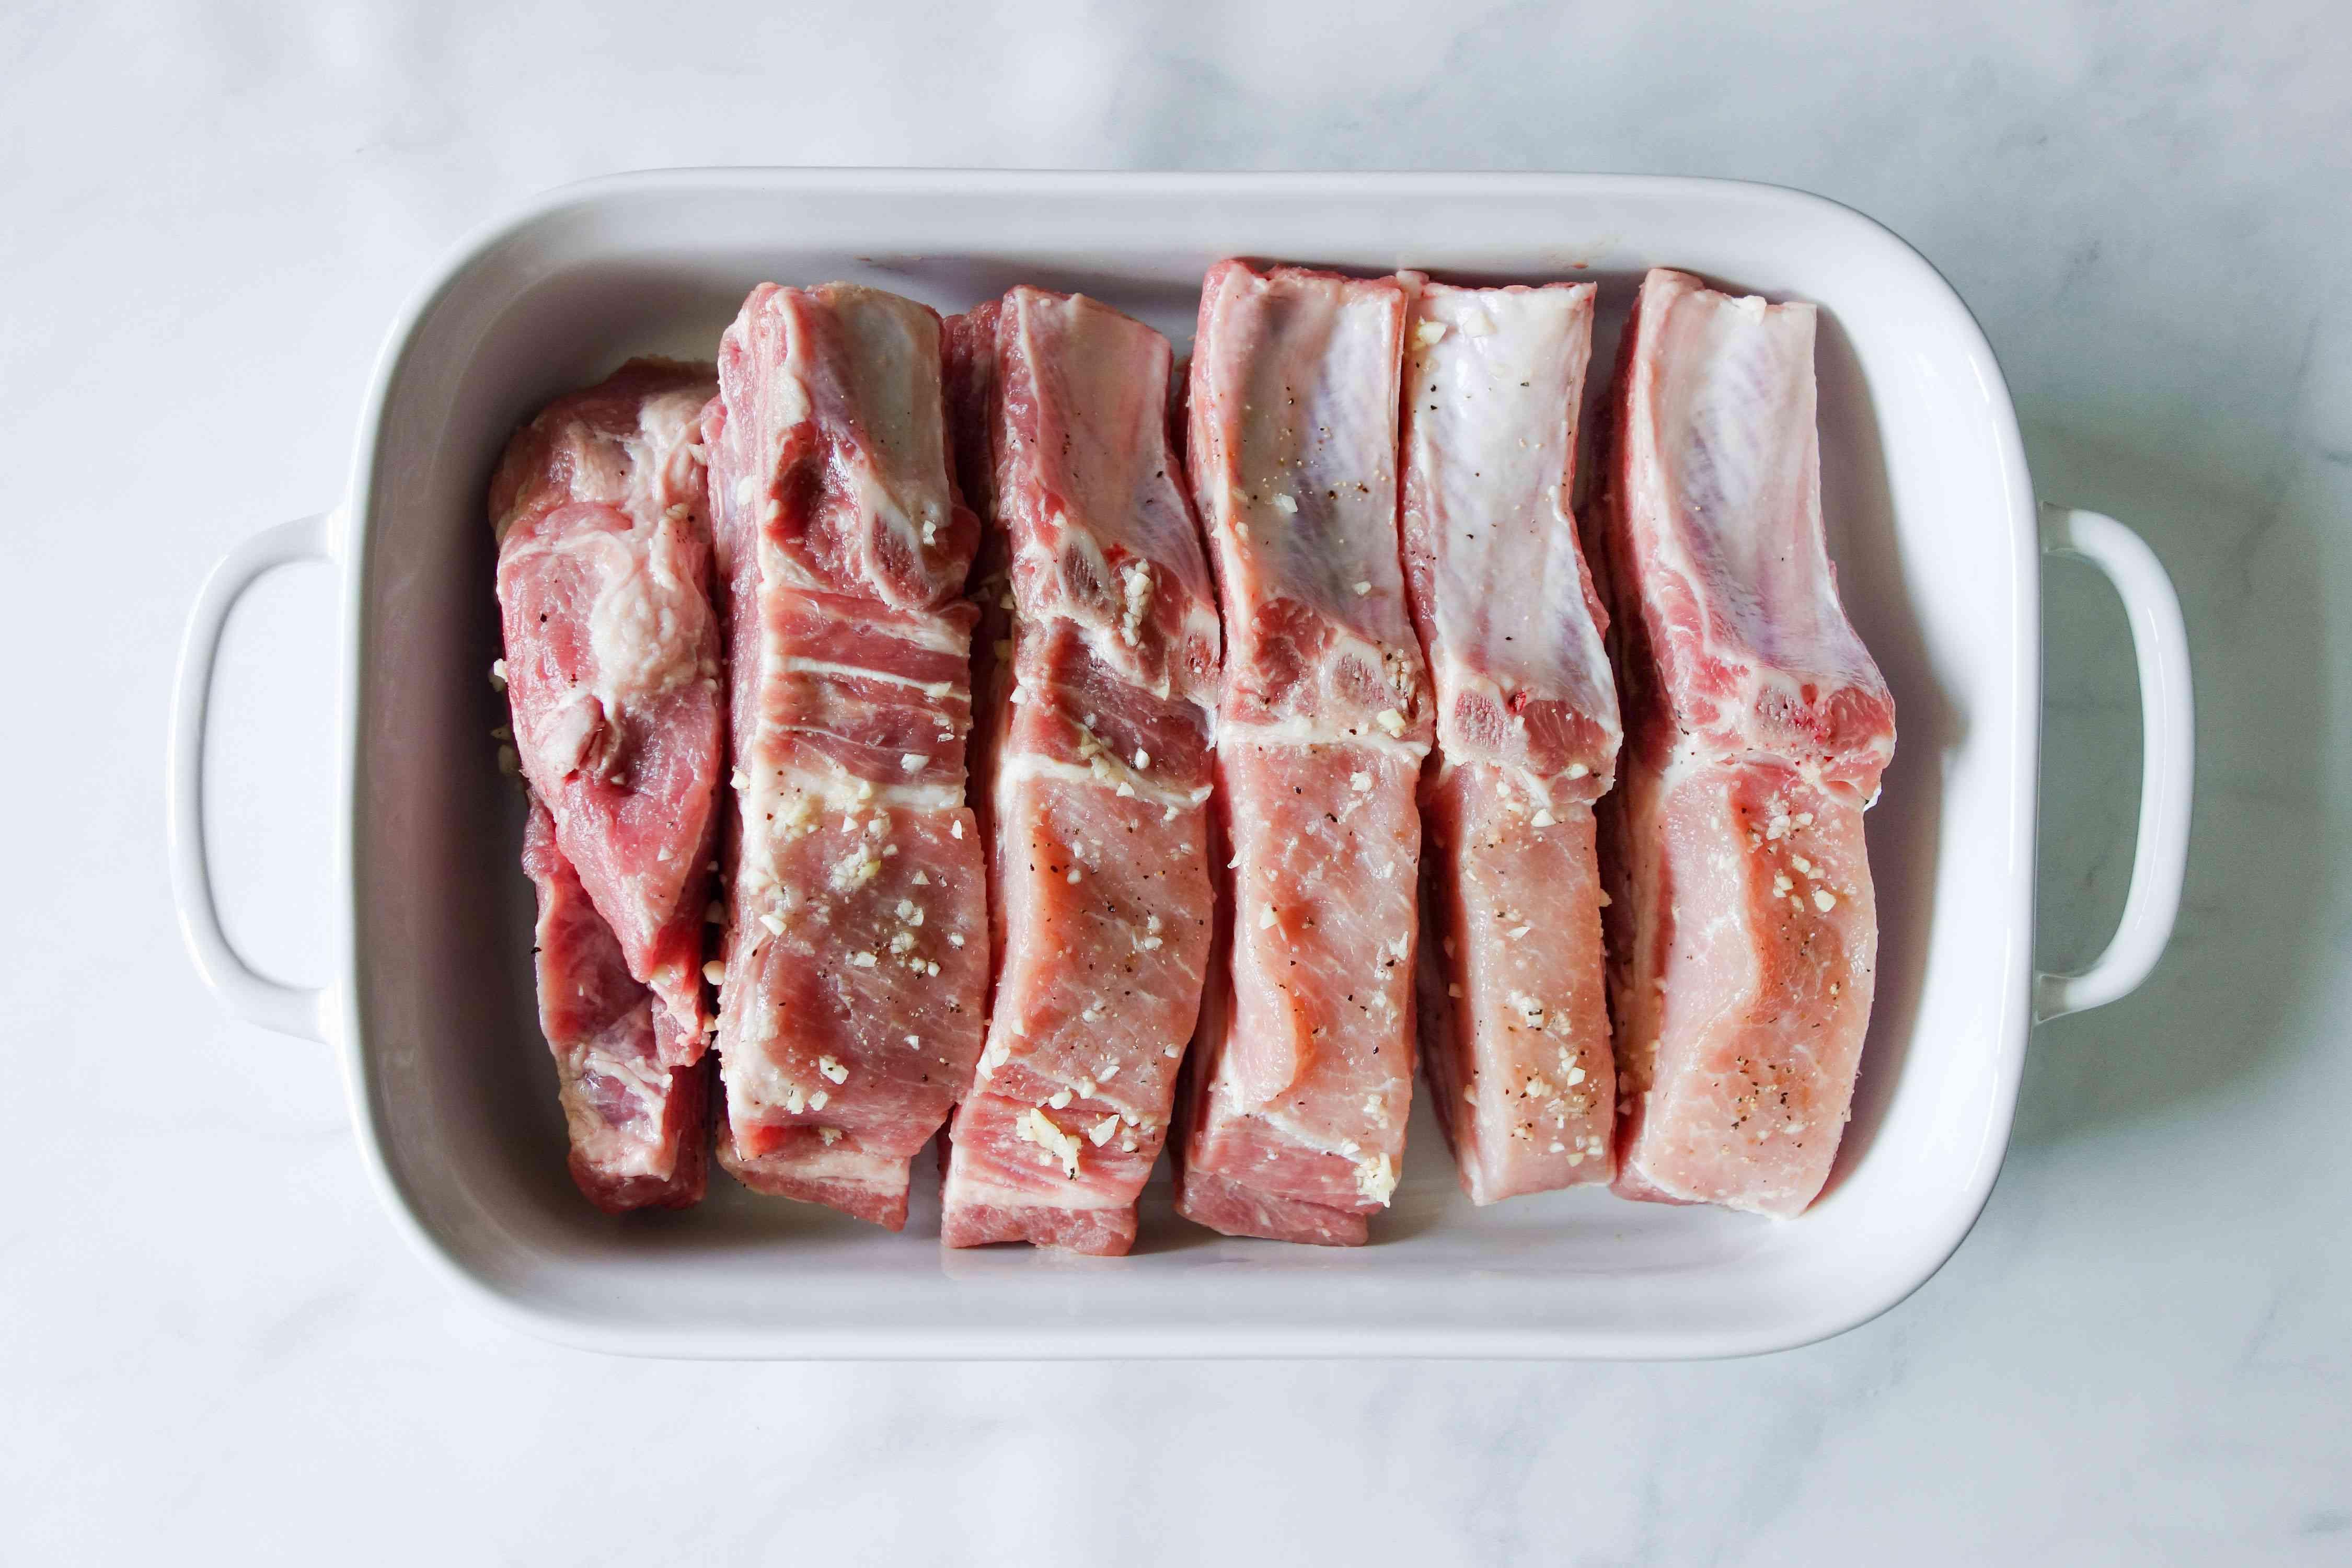 Pork ribs in a roasting pan, meaty-side down